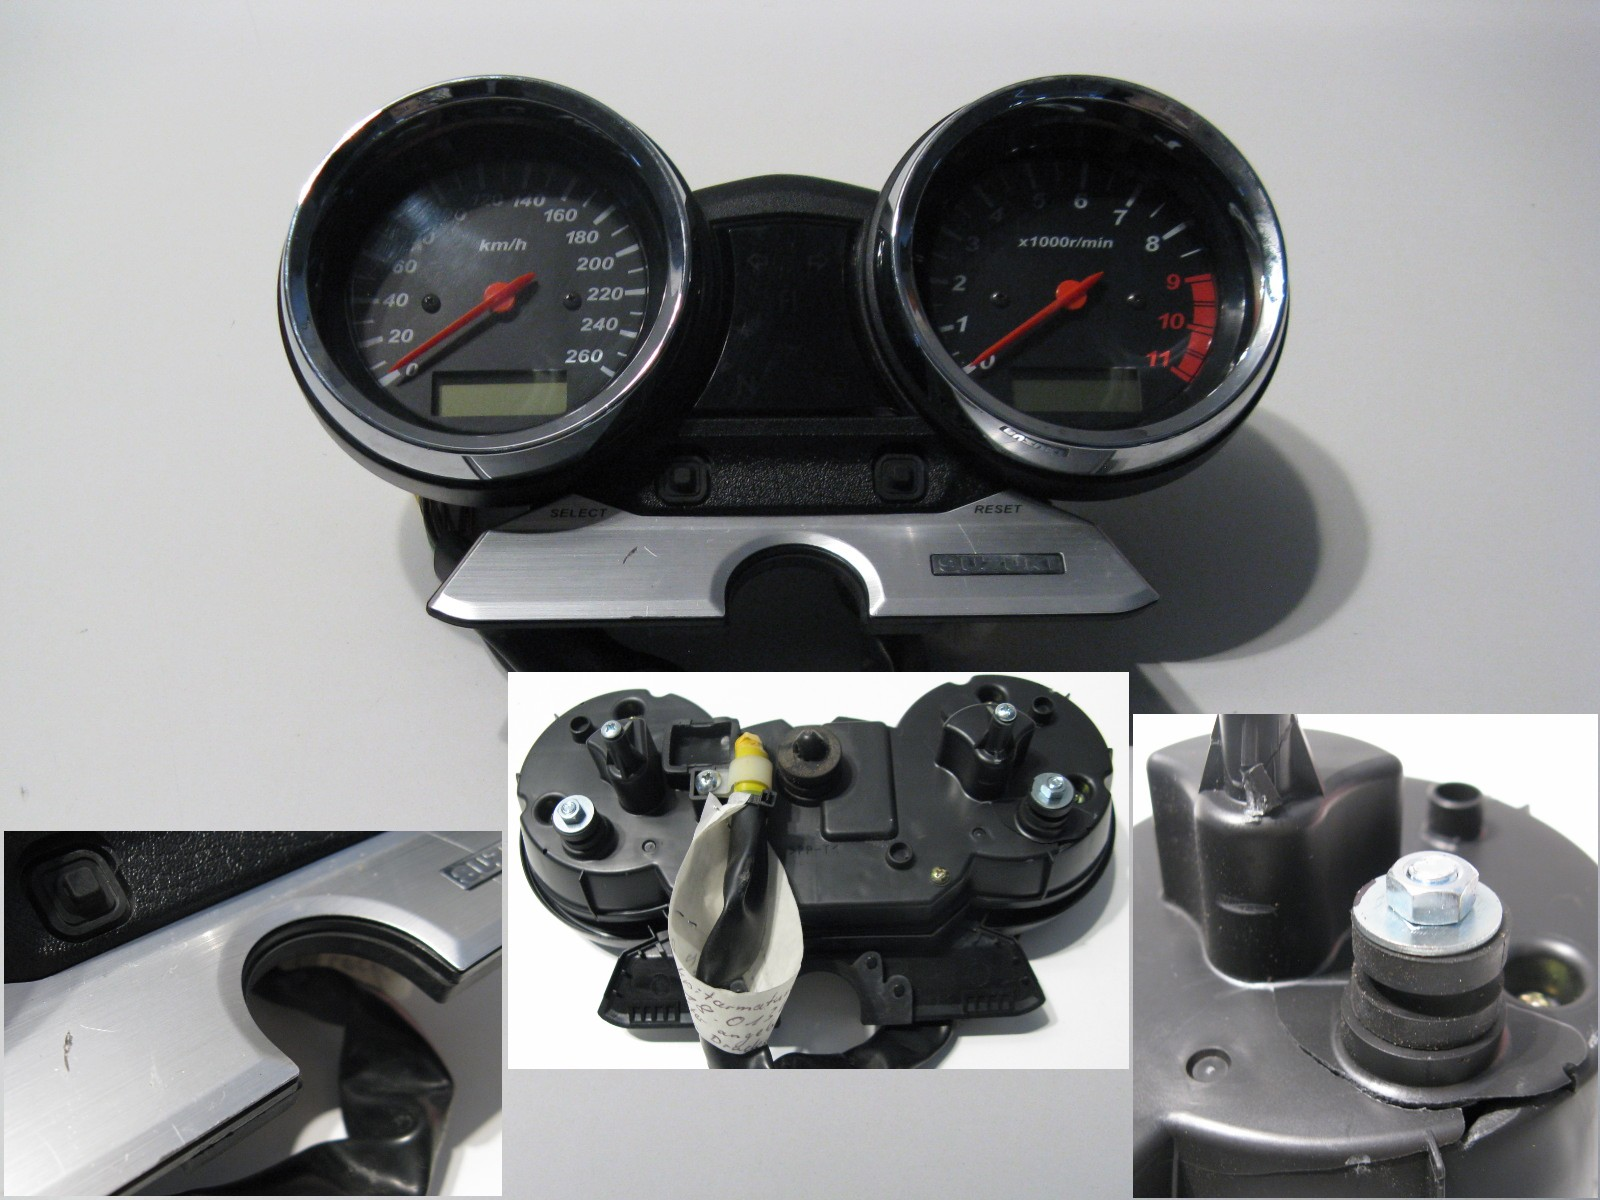 cockpitarmaturen cockpit armaturen tacho suzuki gsx 1400. Black Bedroom Furniture Sets. Home Design Ideas